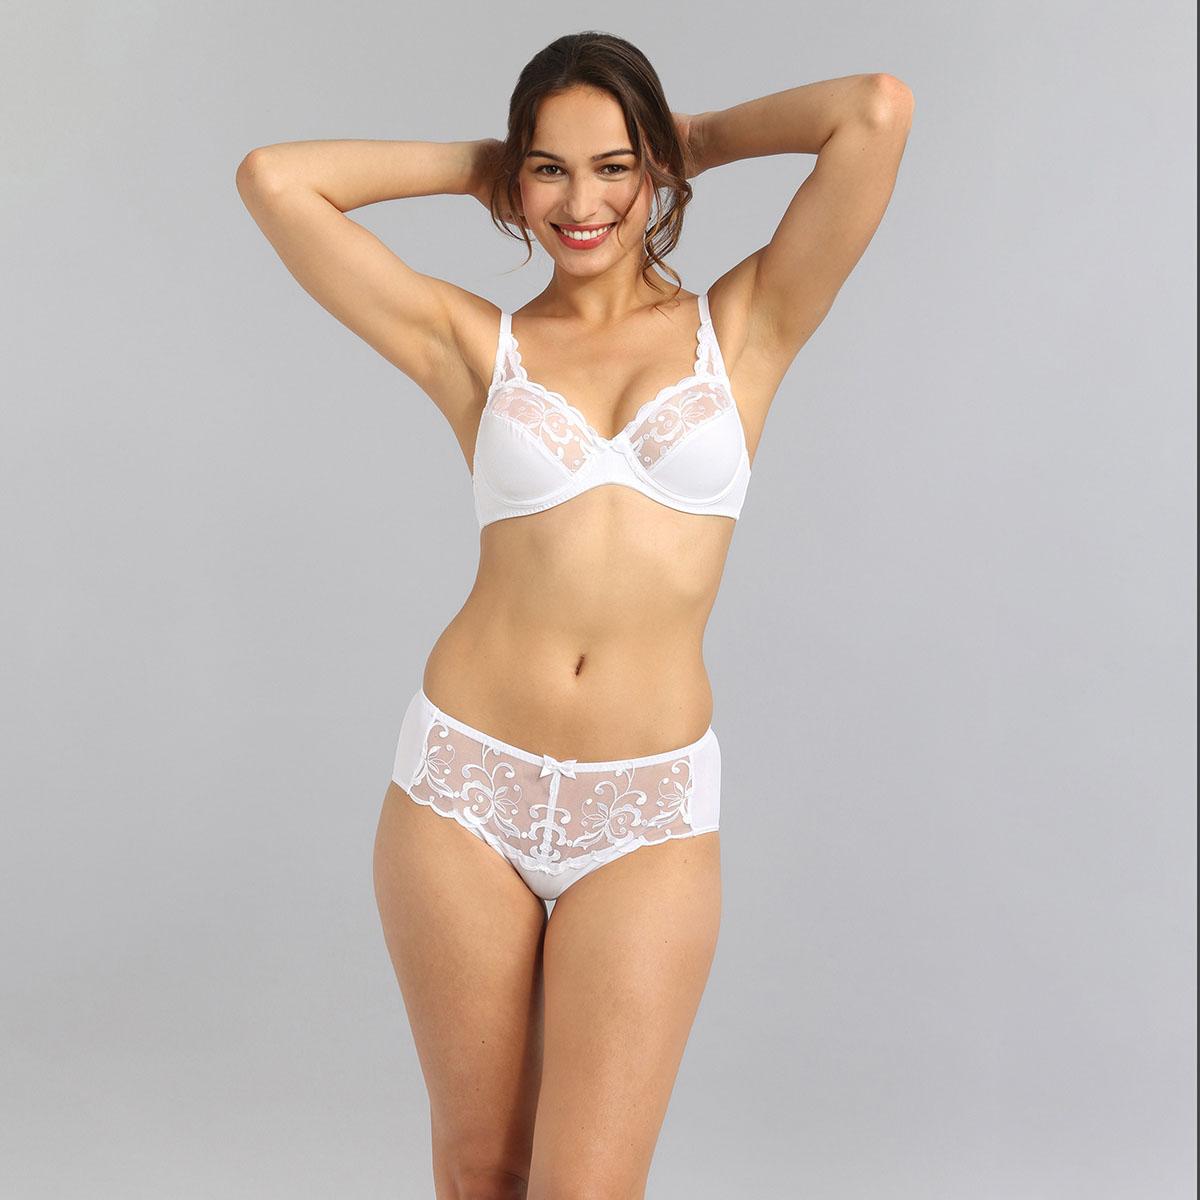 Reggiseno con ferretto bianco Essential Elegance Embroidery, , PLAYTEX